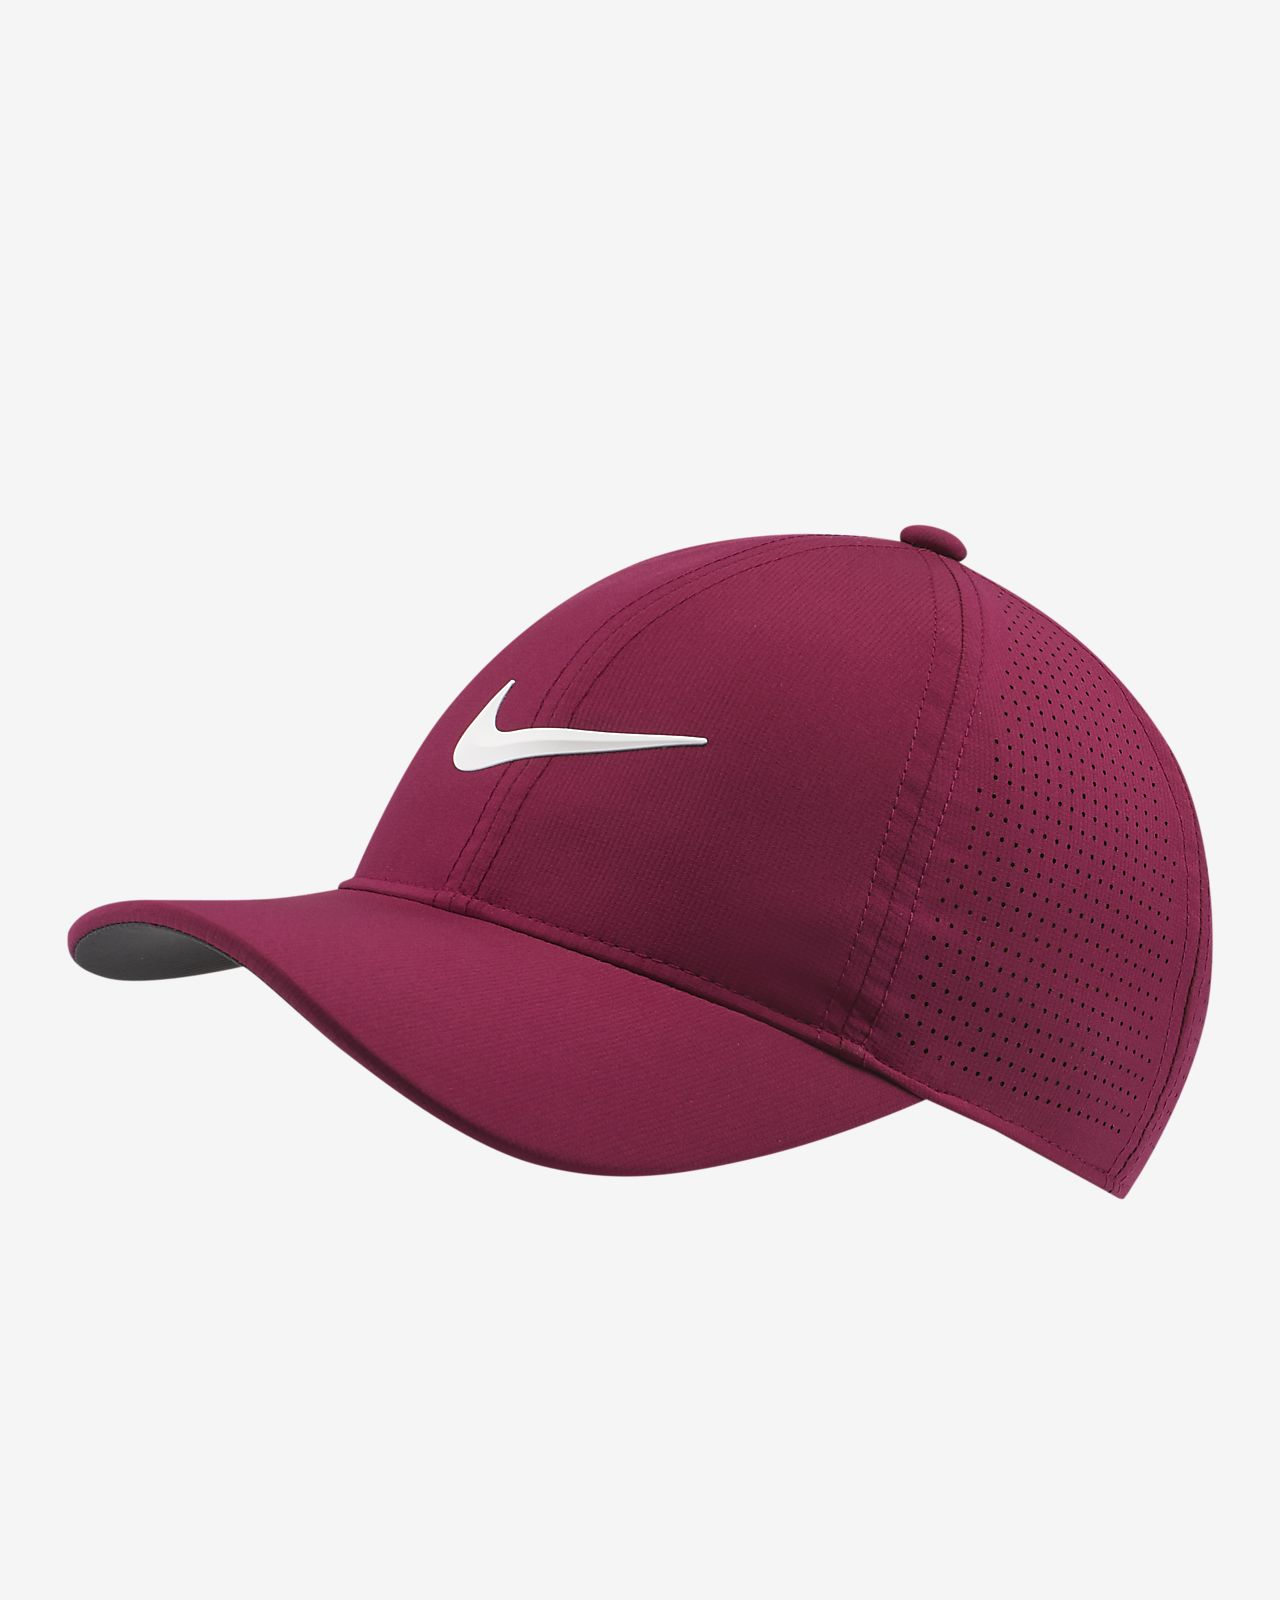 dcb1abad36262 Nike AeroBill Legacy91 Women s Golf Hat. Nike.com